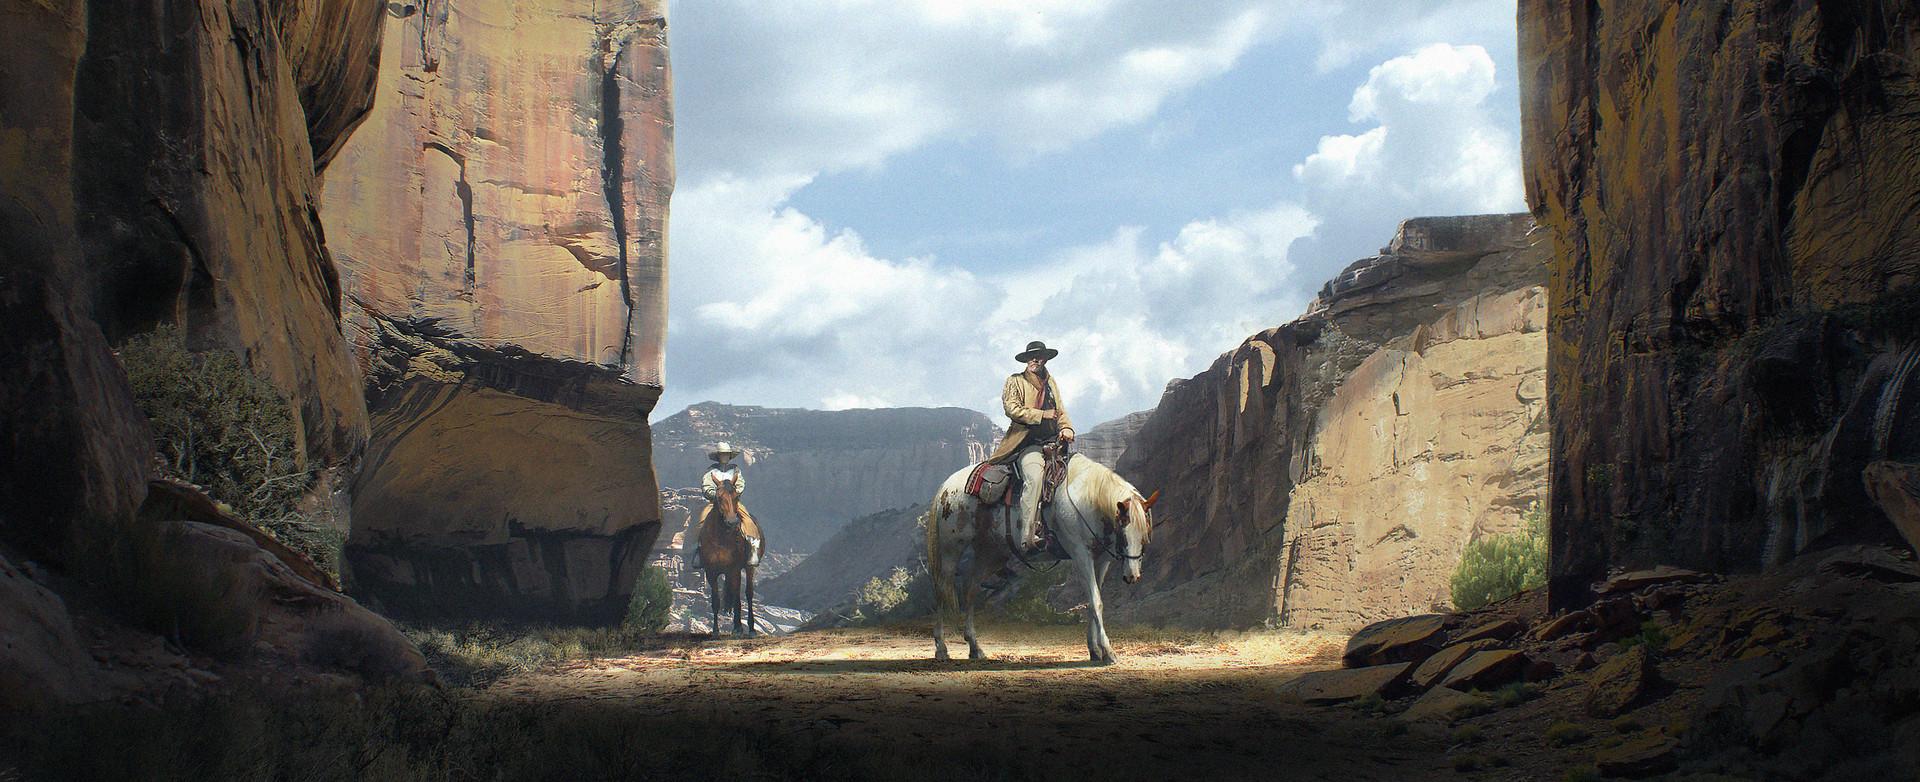 alexey-trishkin-cowboy-03-c.jpg?15165257